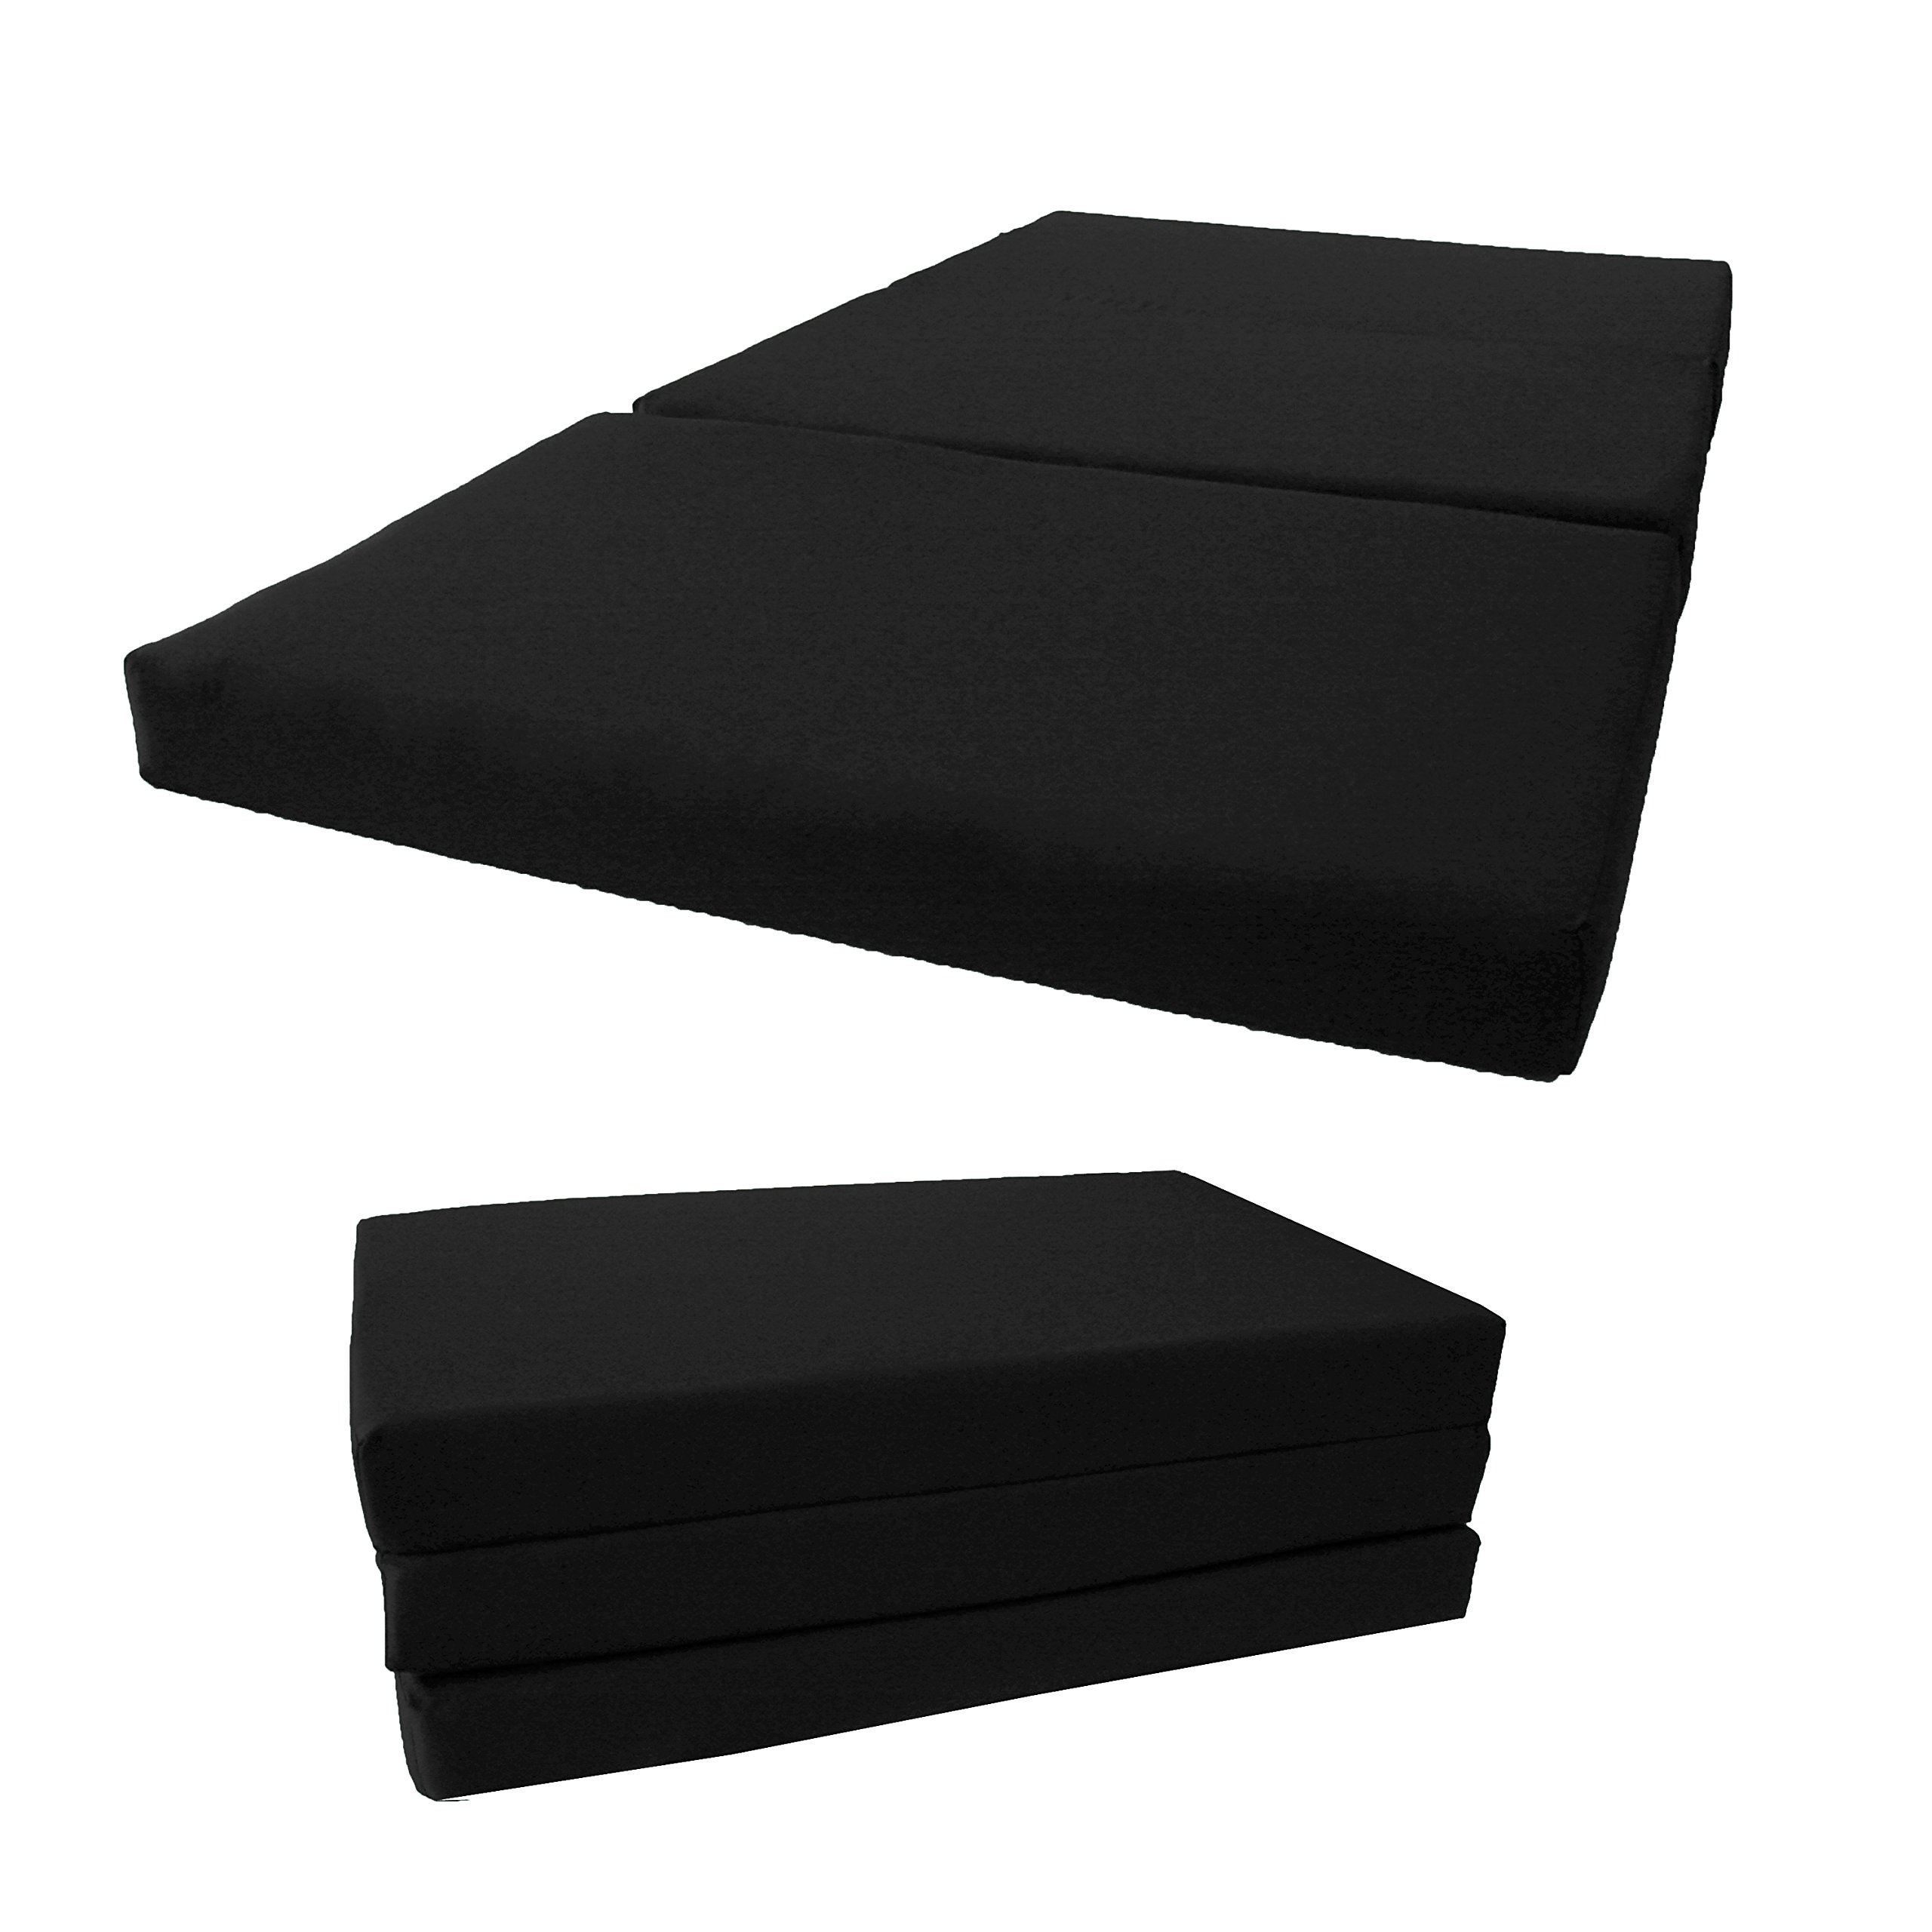 Brand New Shikibuton Tri Fold Foam Beds, Tri-Fold Bed, High Density 1.8 lbs Foam, Twin Size, Full, Queen Folding Mattresses. (Queen Size 4x60x80, Black) by D&D Futon Furniture